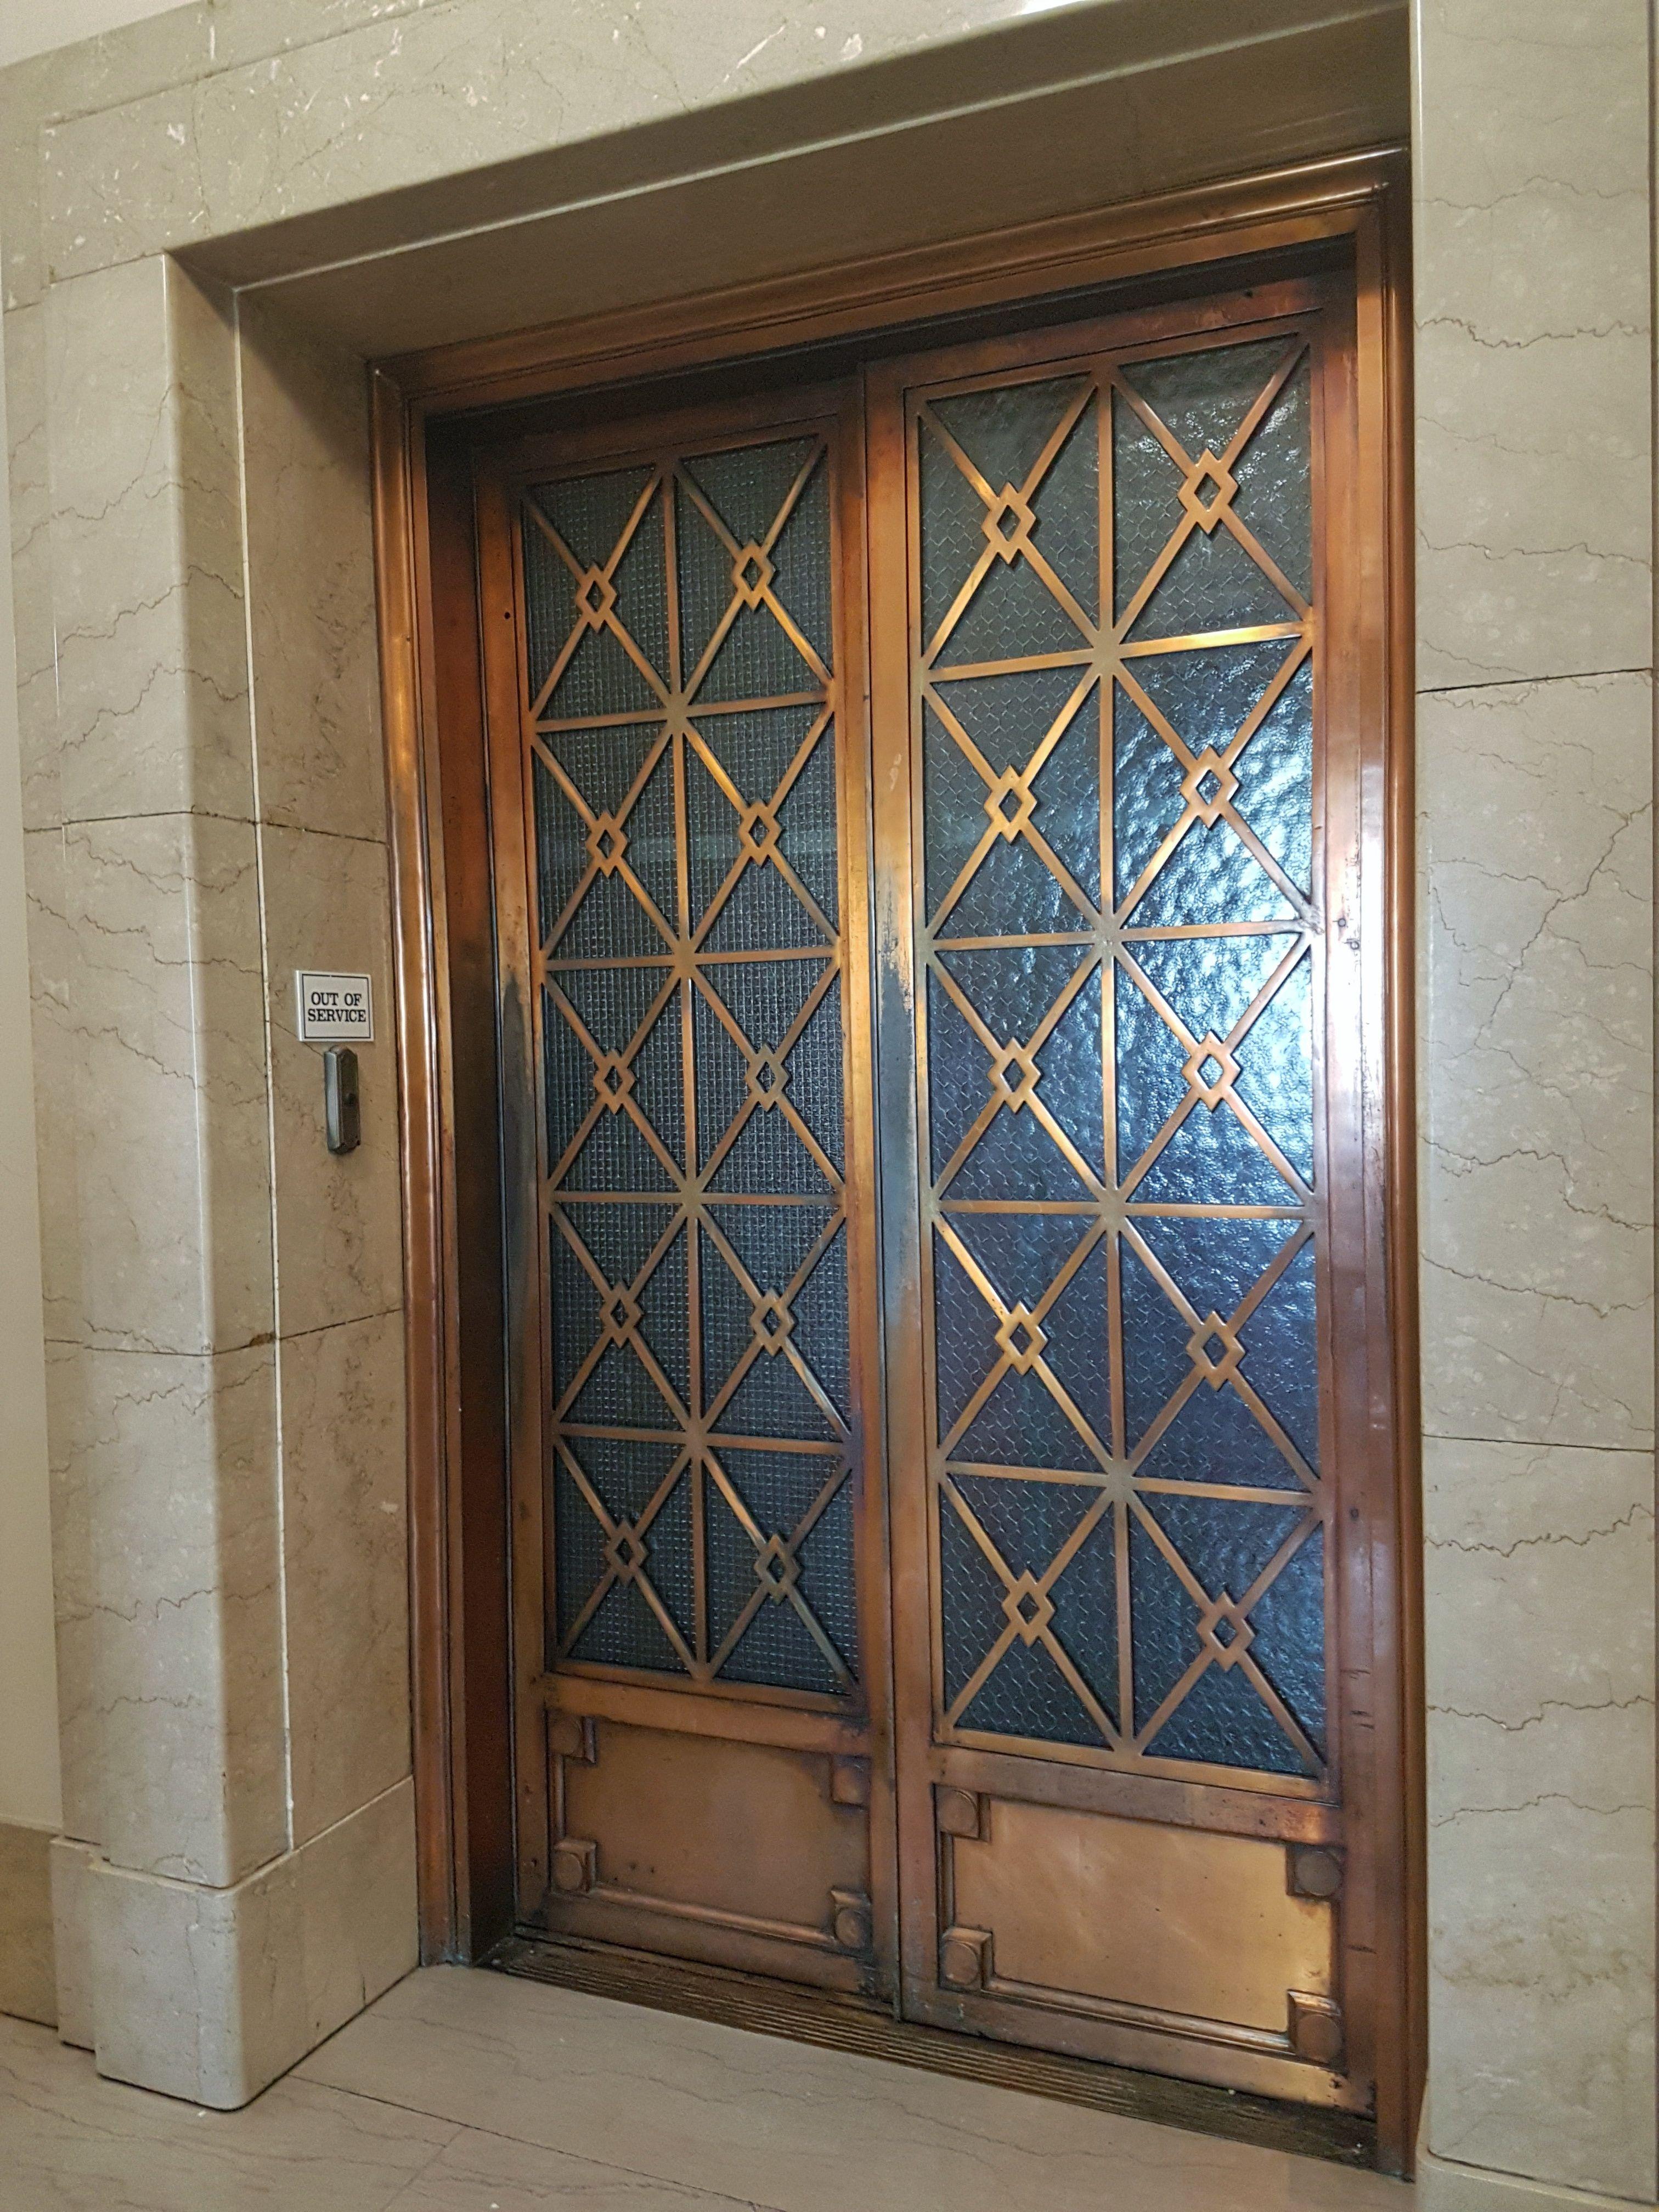 Doors open winnipeg manitoba legislative building design decor